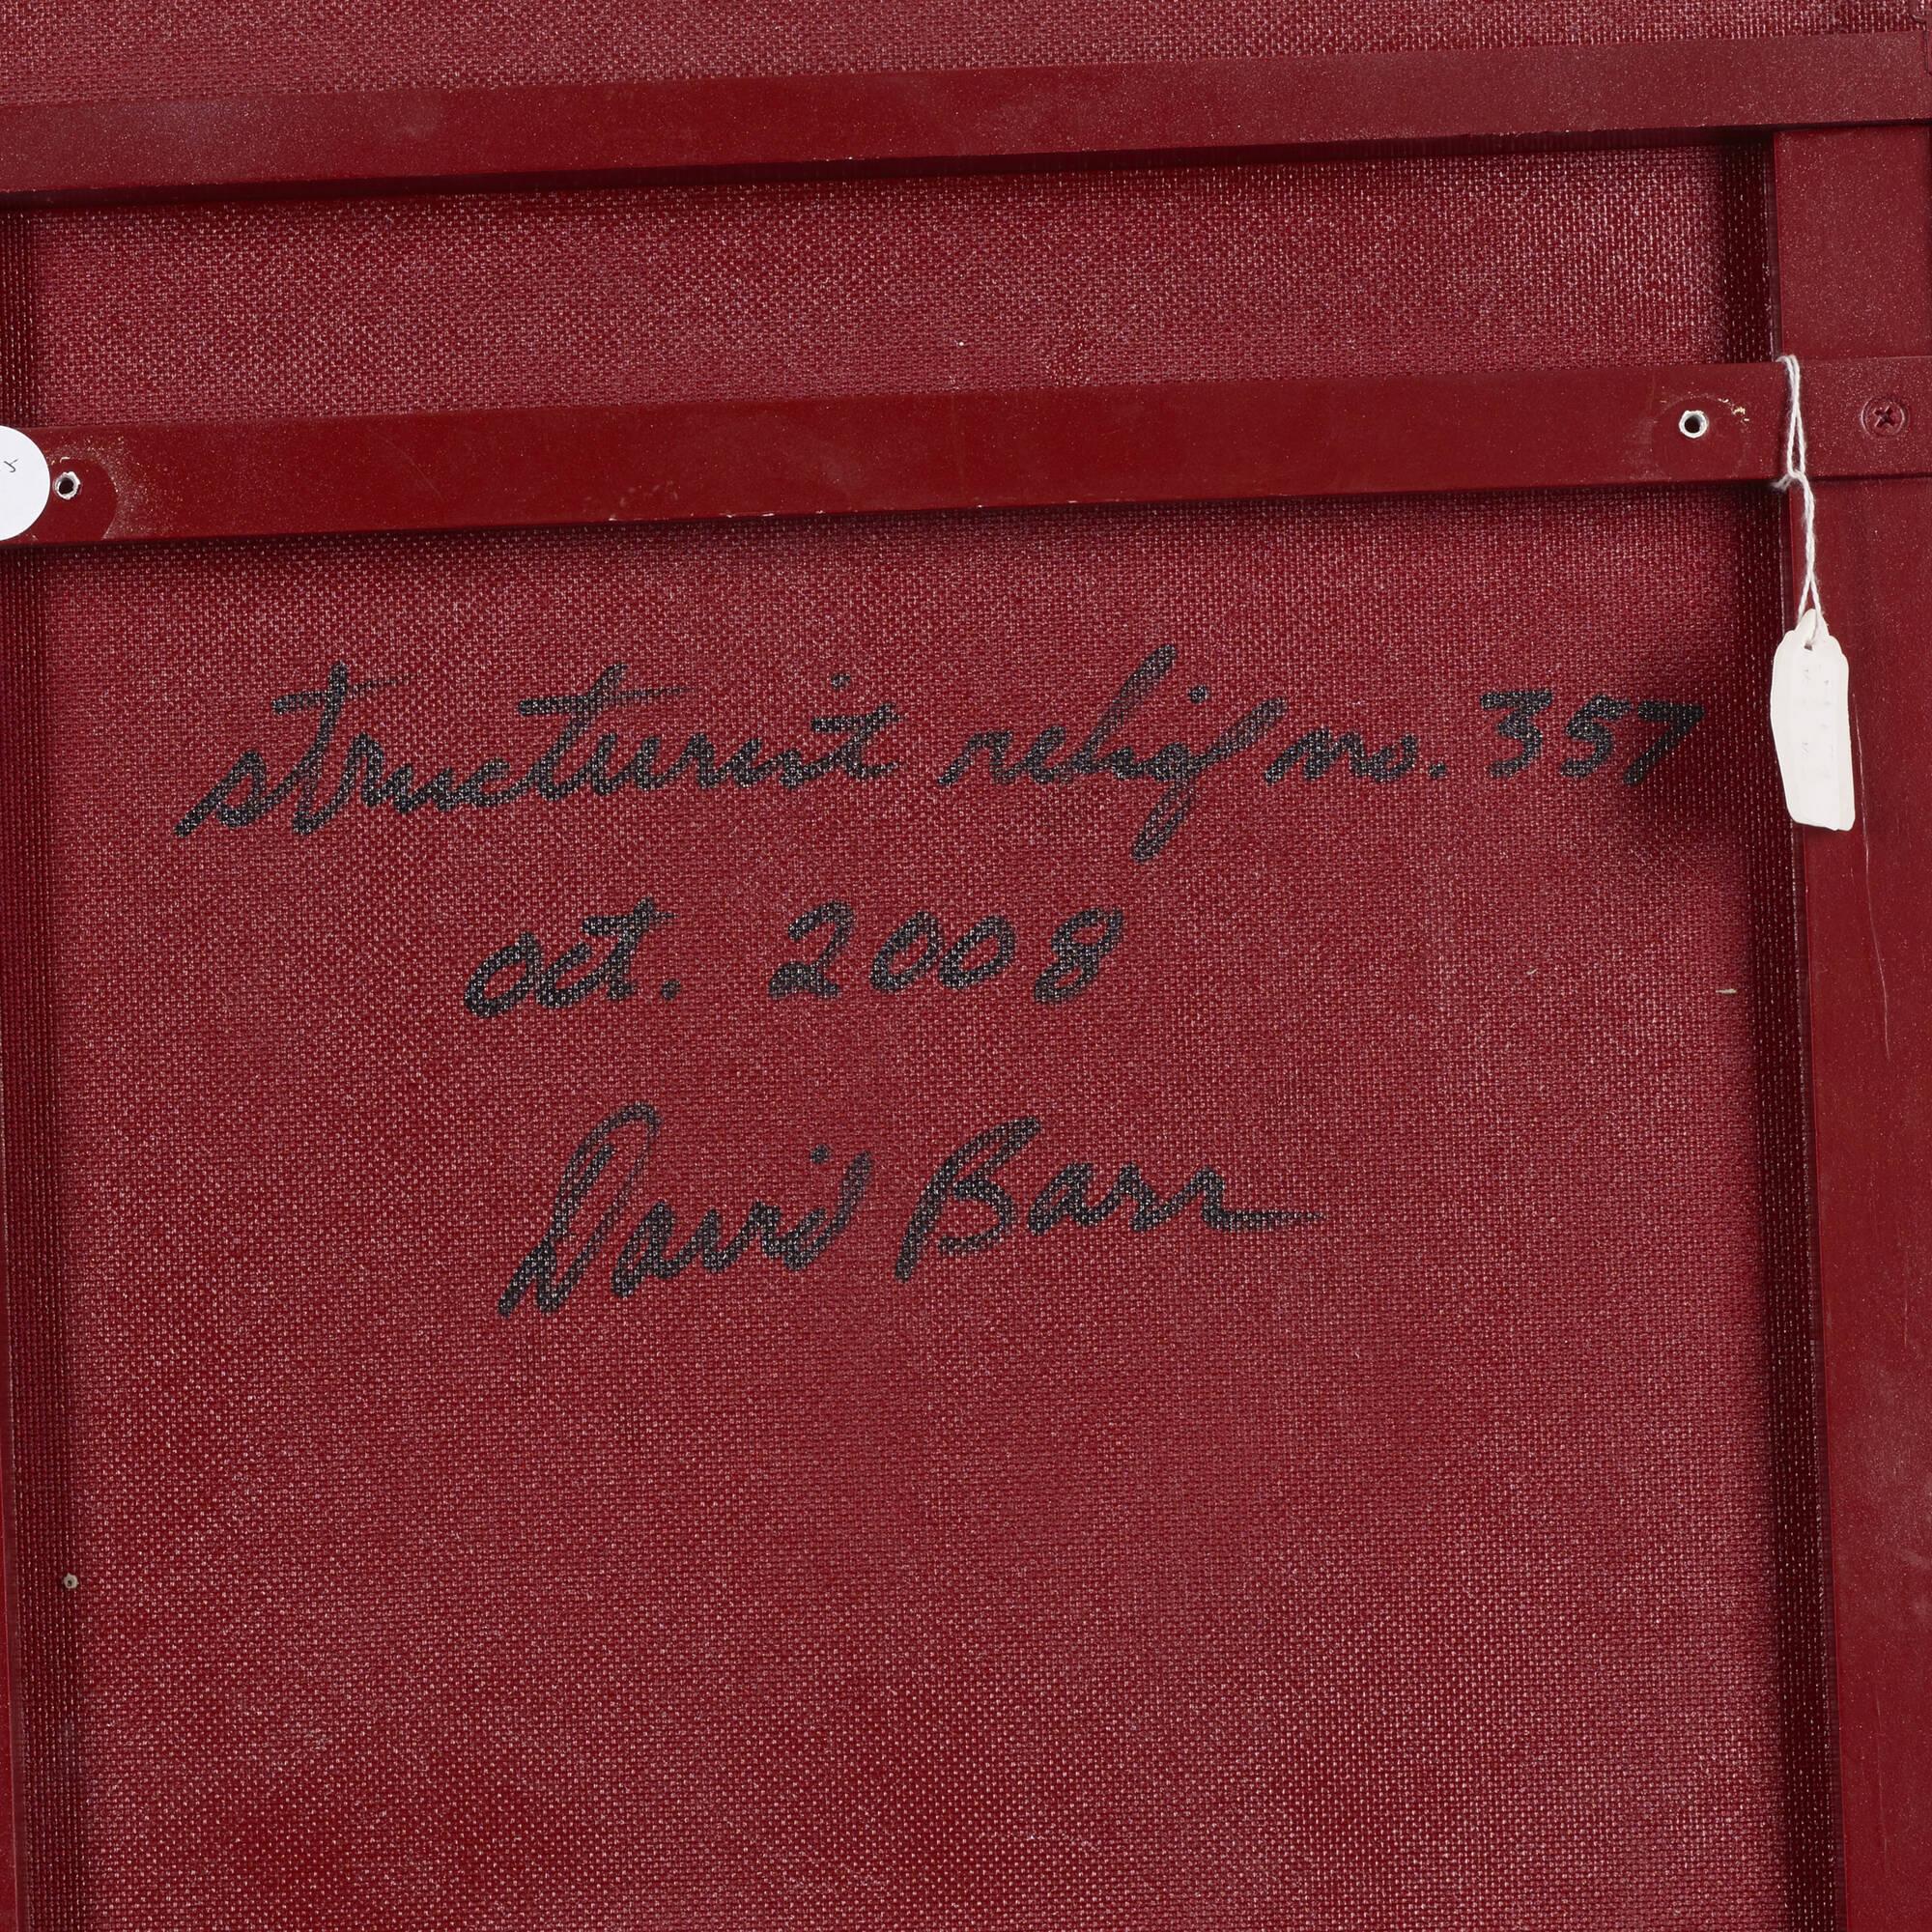 117: David Barr / Structurist Relief No. 357 (3 of 3)